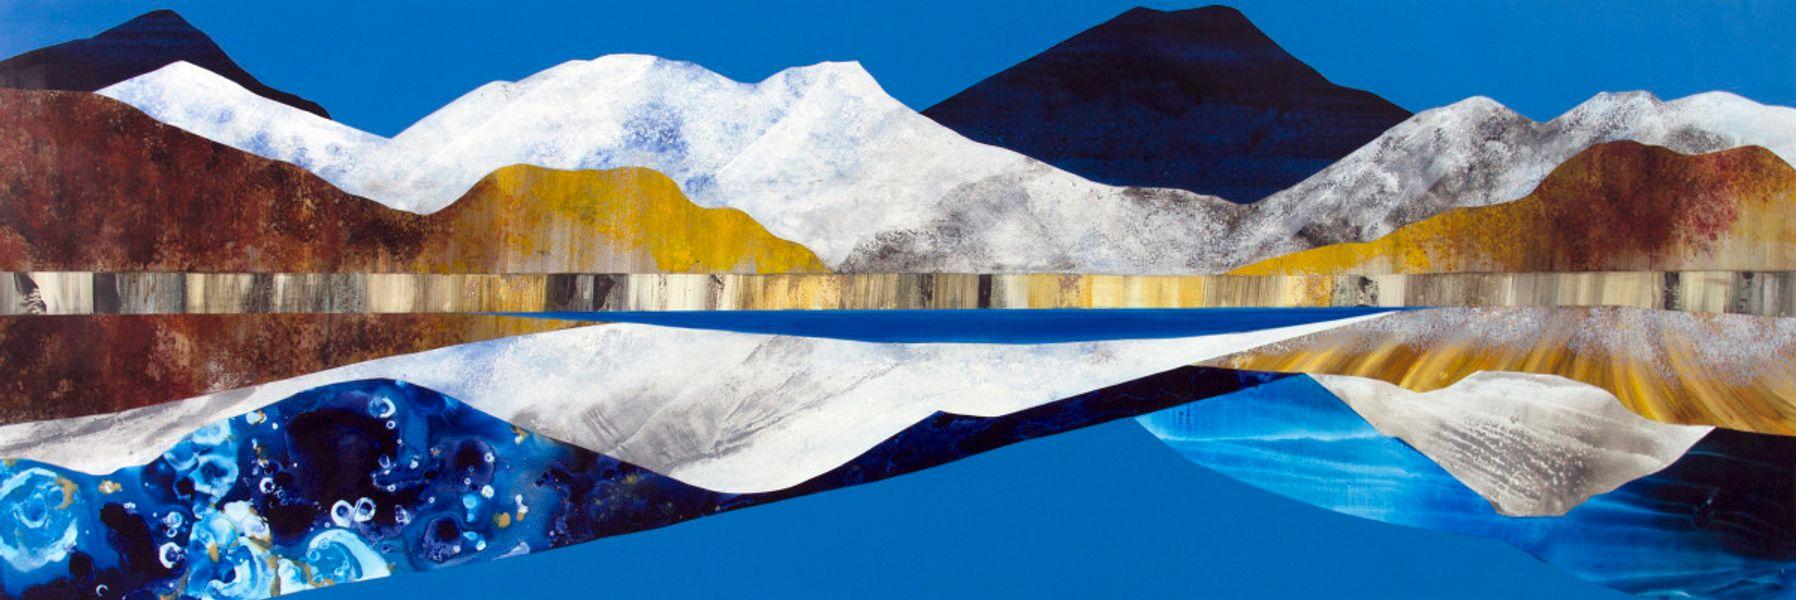 Winter Mountain, Bluebird Sky